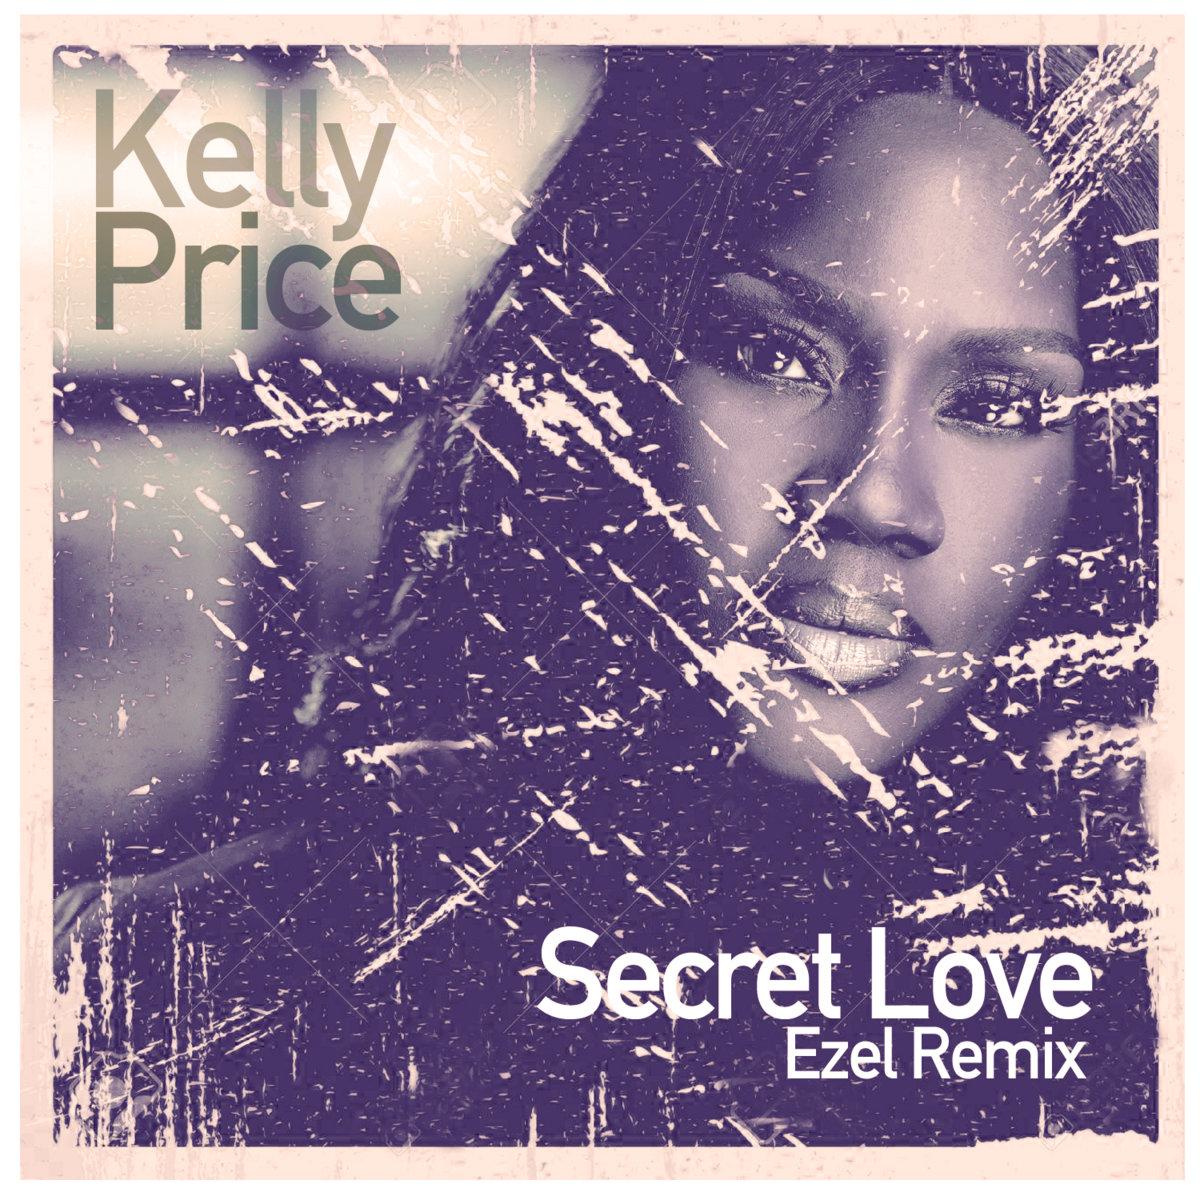 Kelly Price - Secret Love (Ezel Remix) [bandcamp]